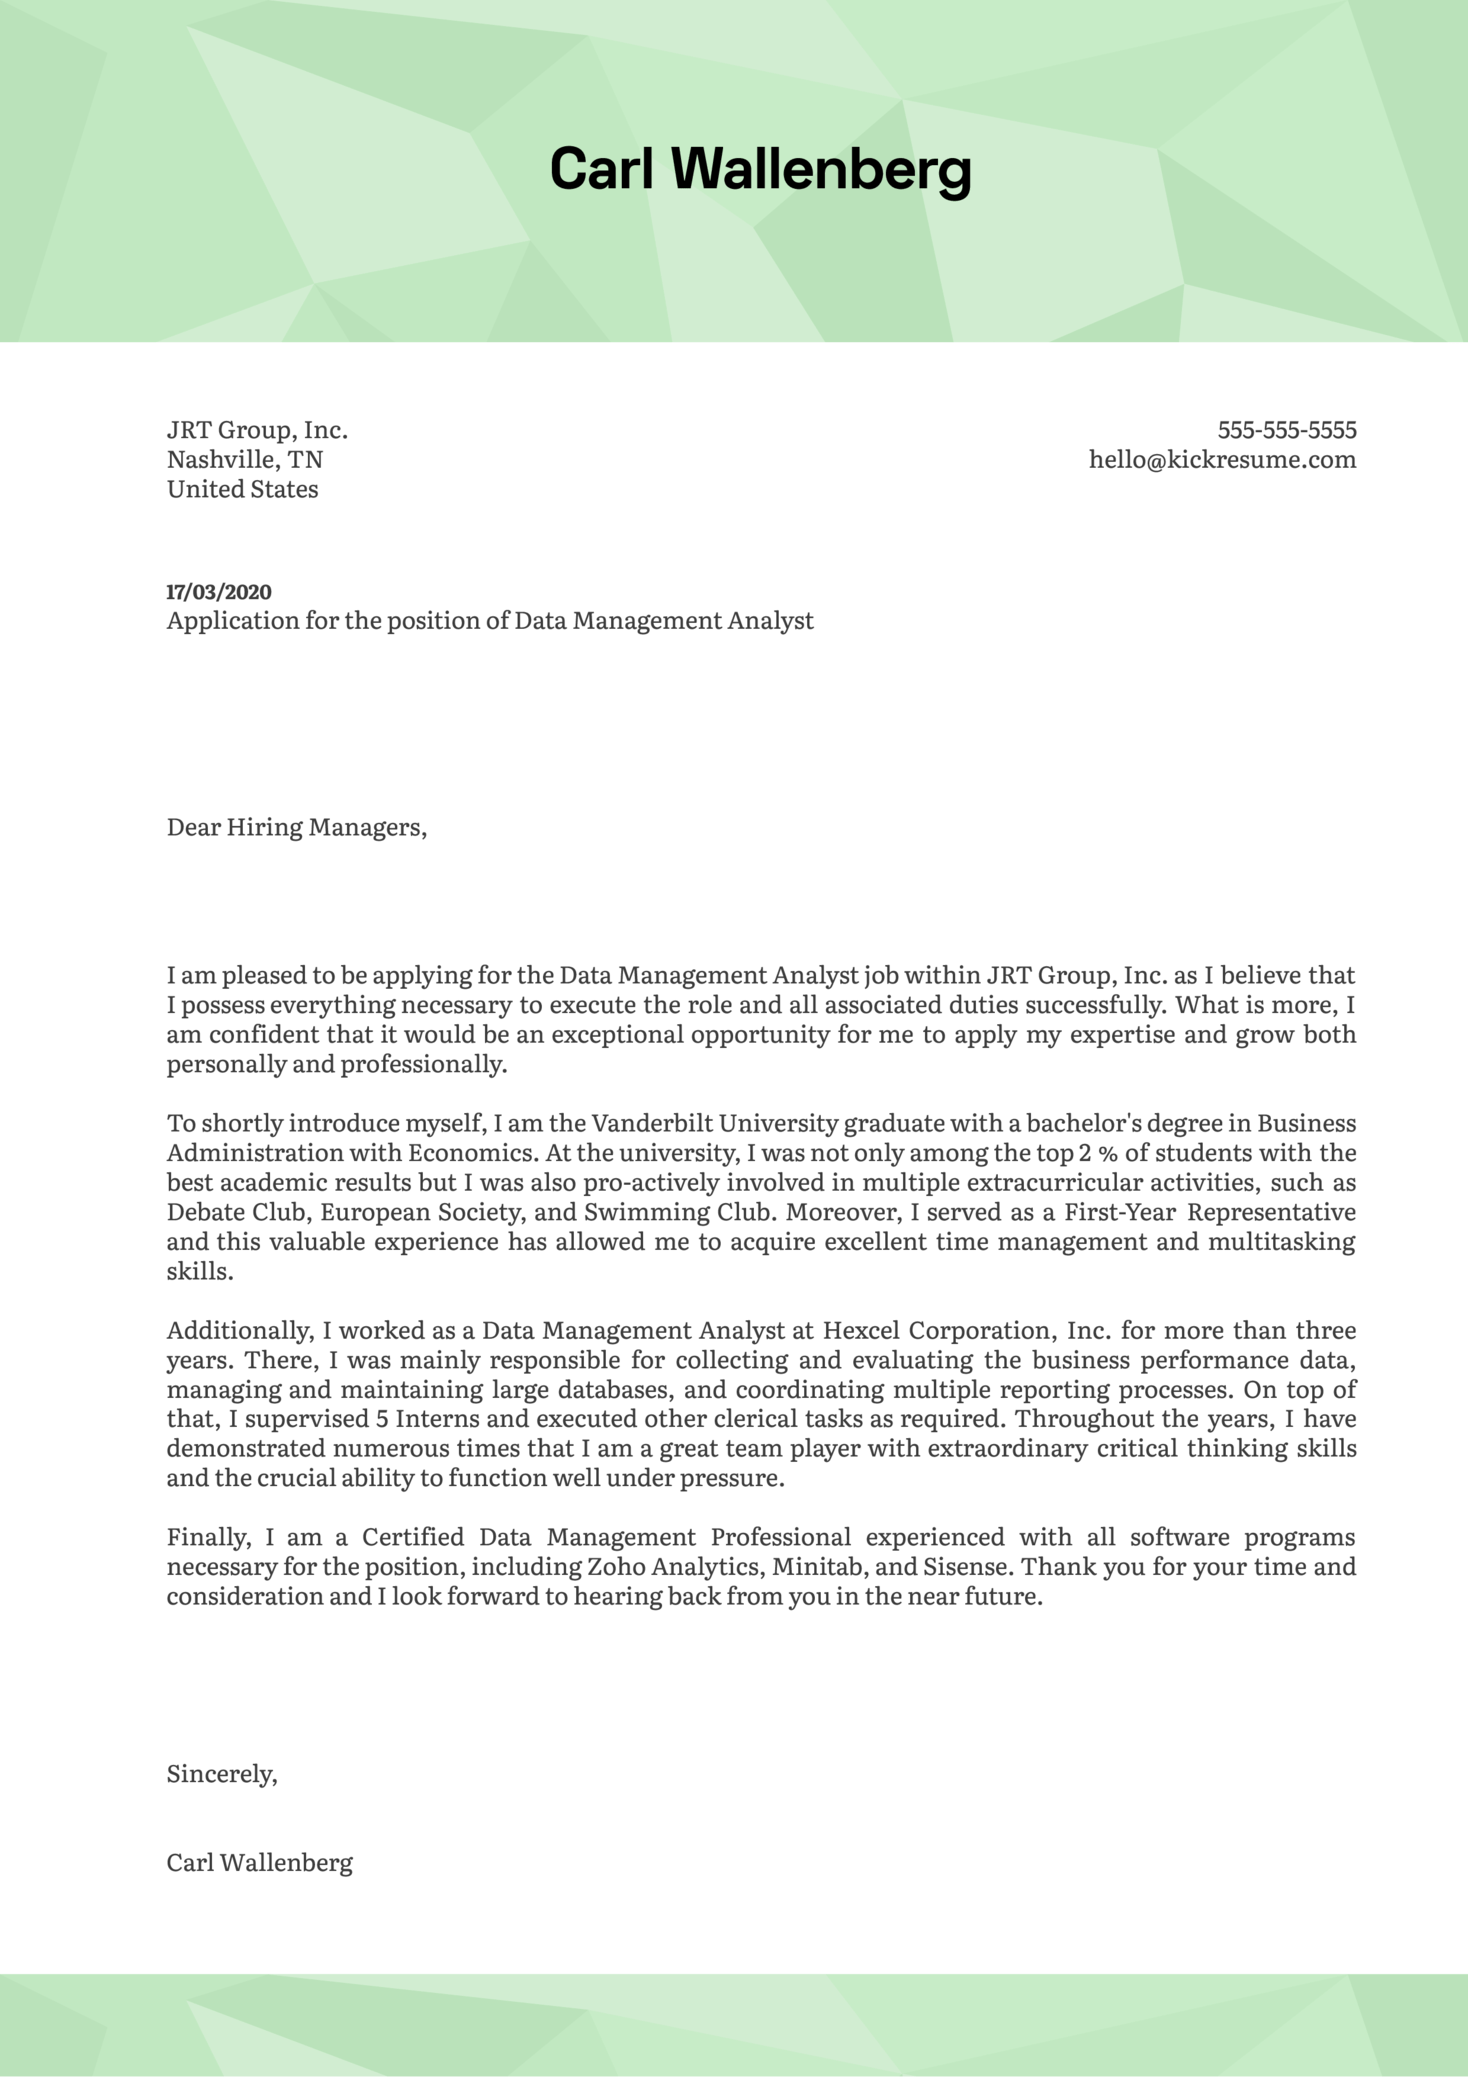 Data Management Analyst Cover Letter Sample